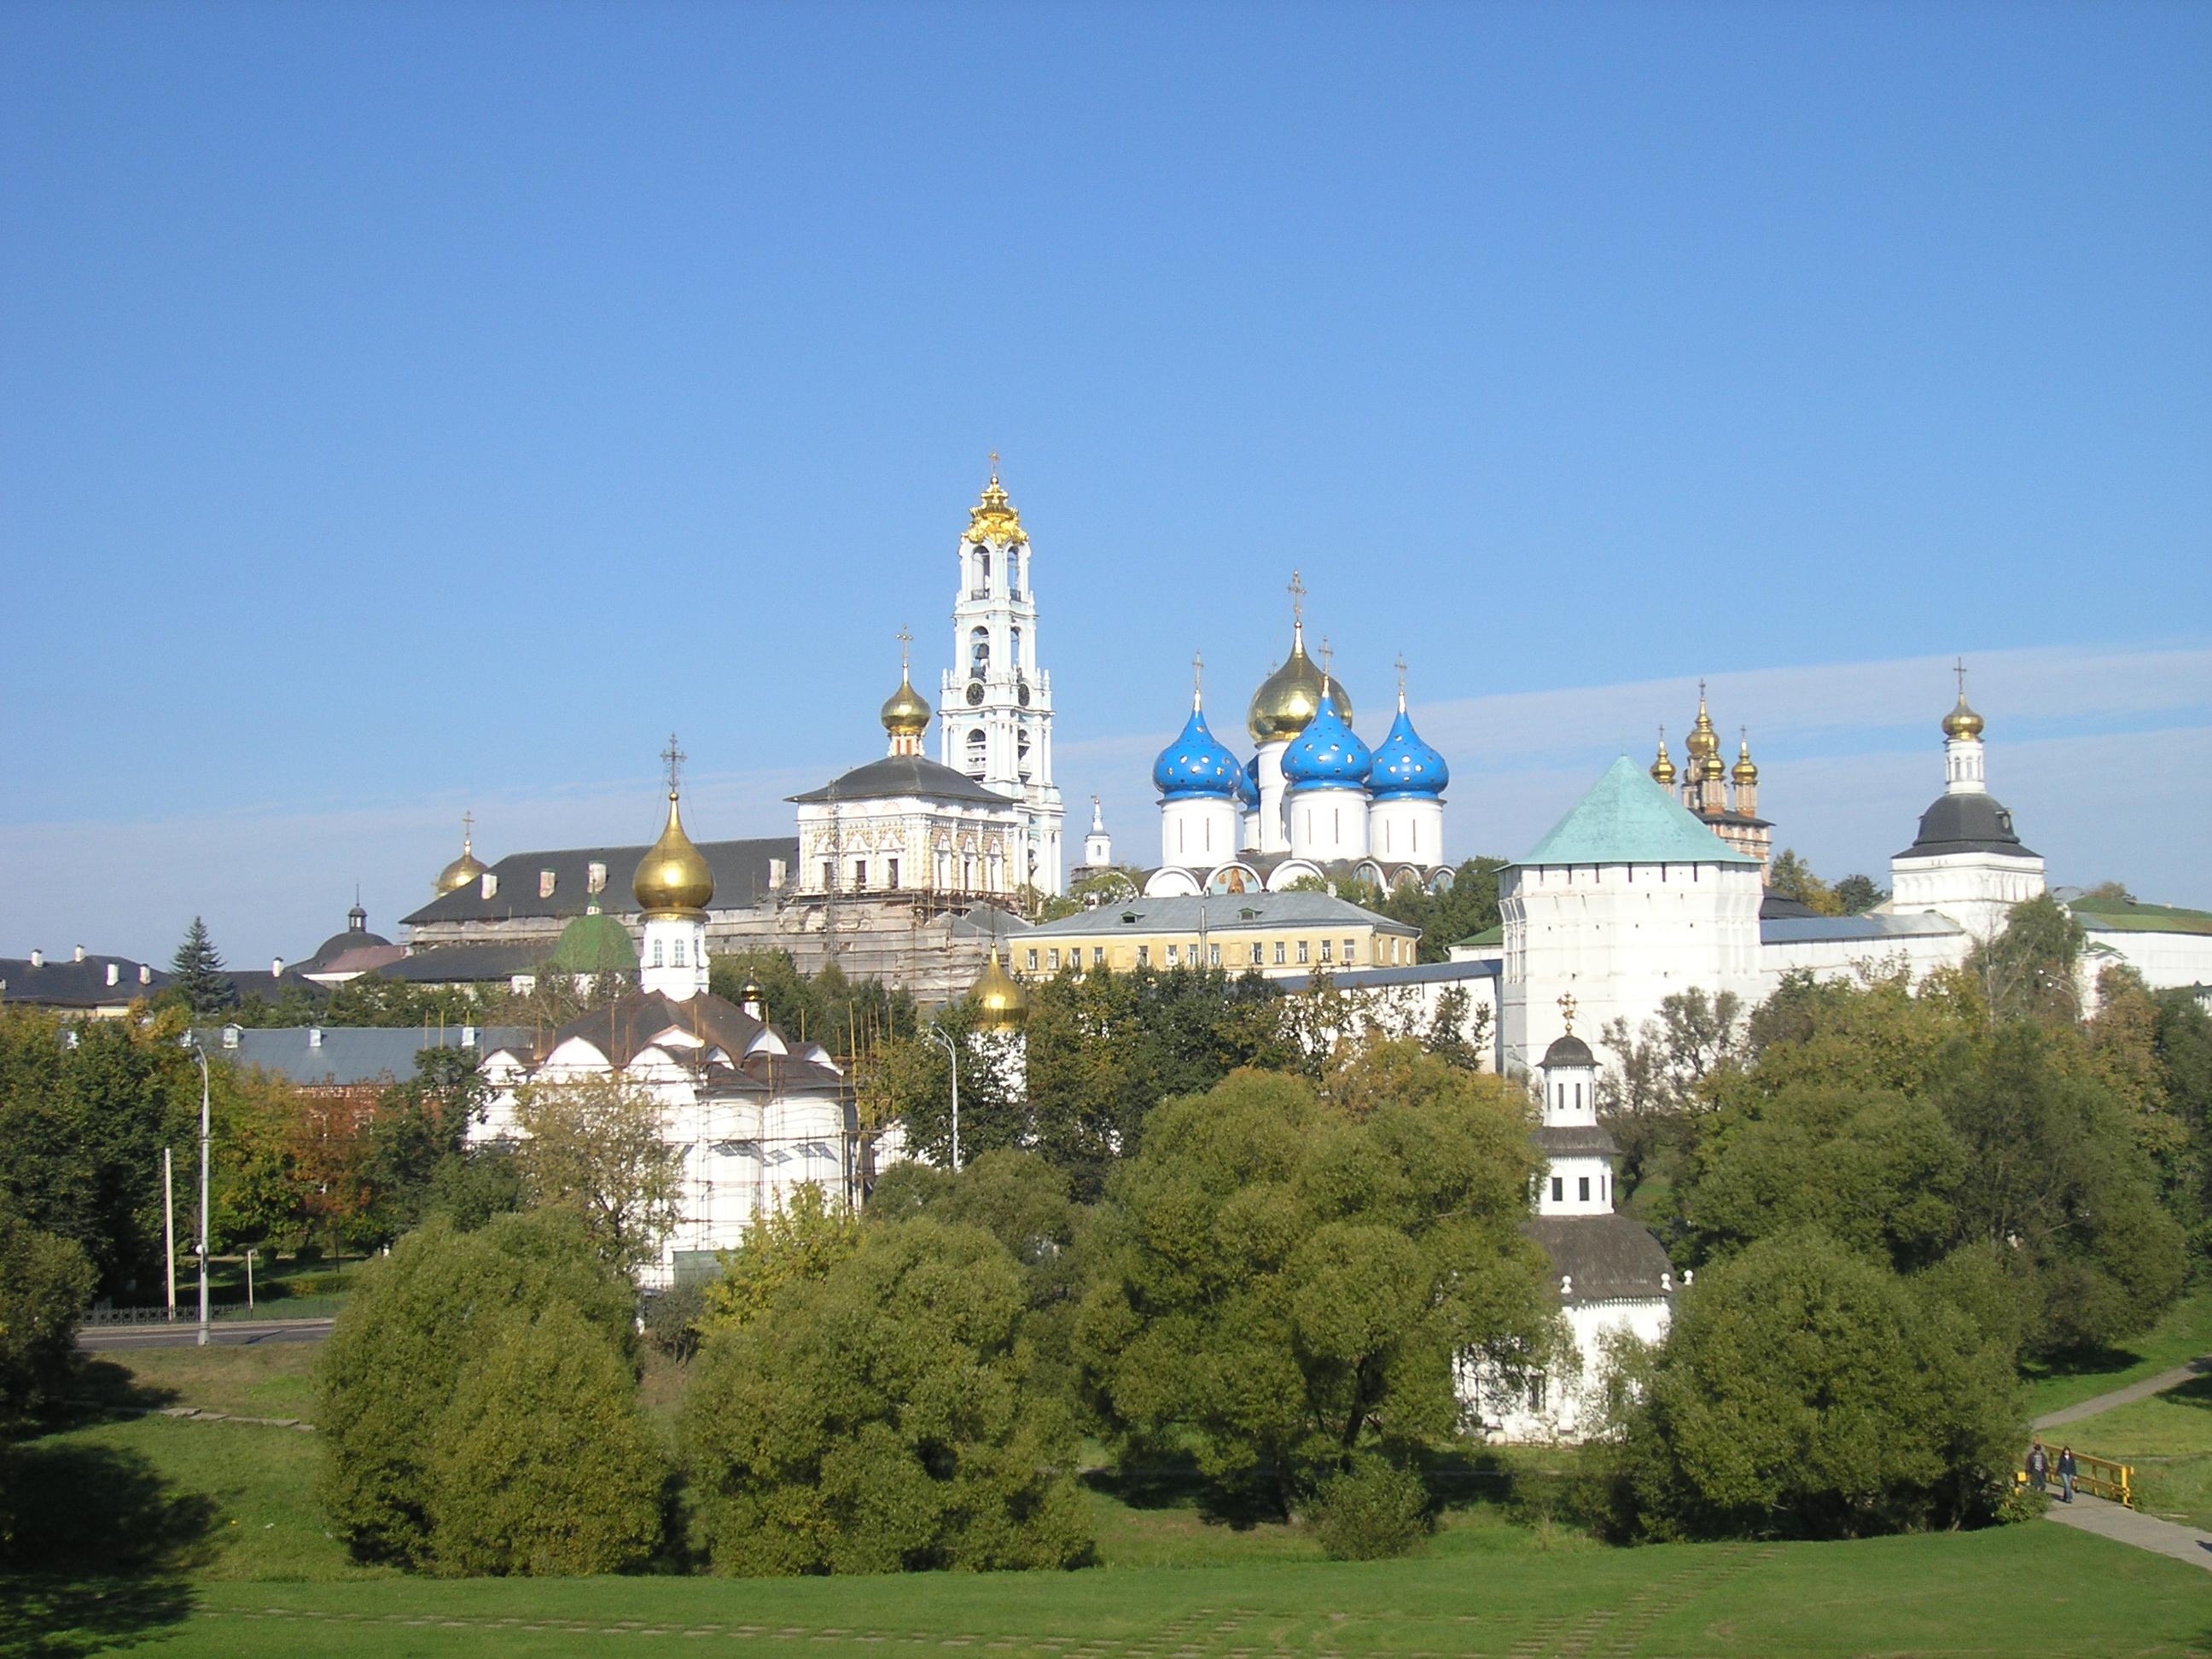 Sergiyev Posad Russia  city images : Sergiyev Posad